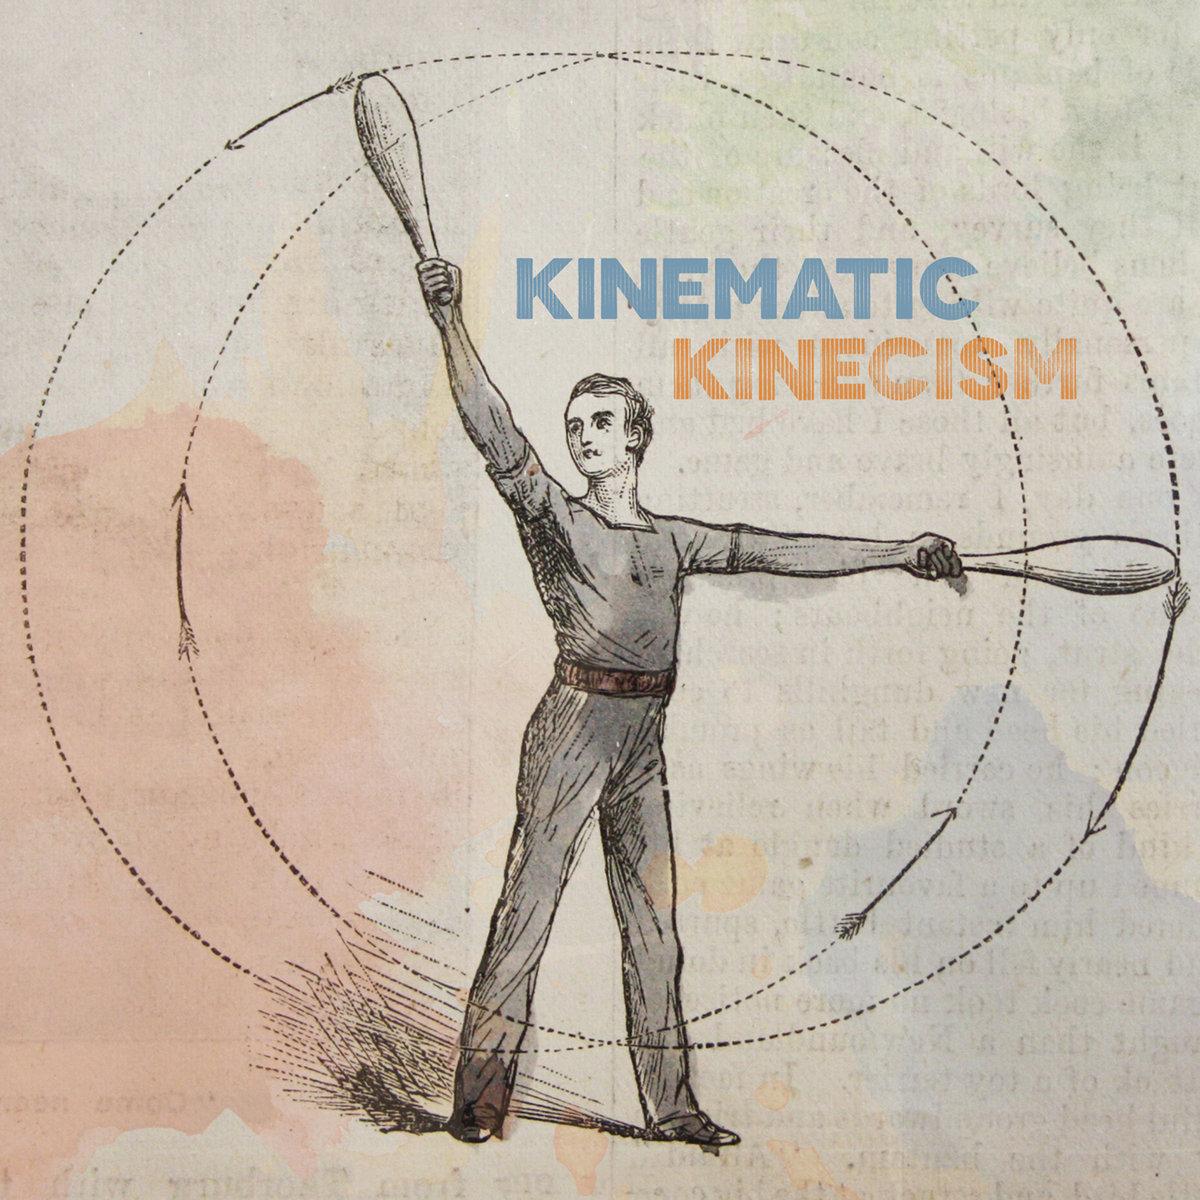 the wedding song kinematic